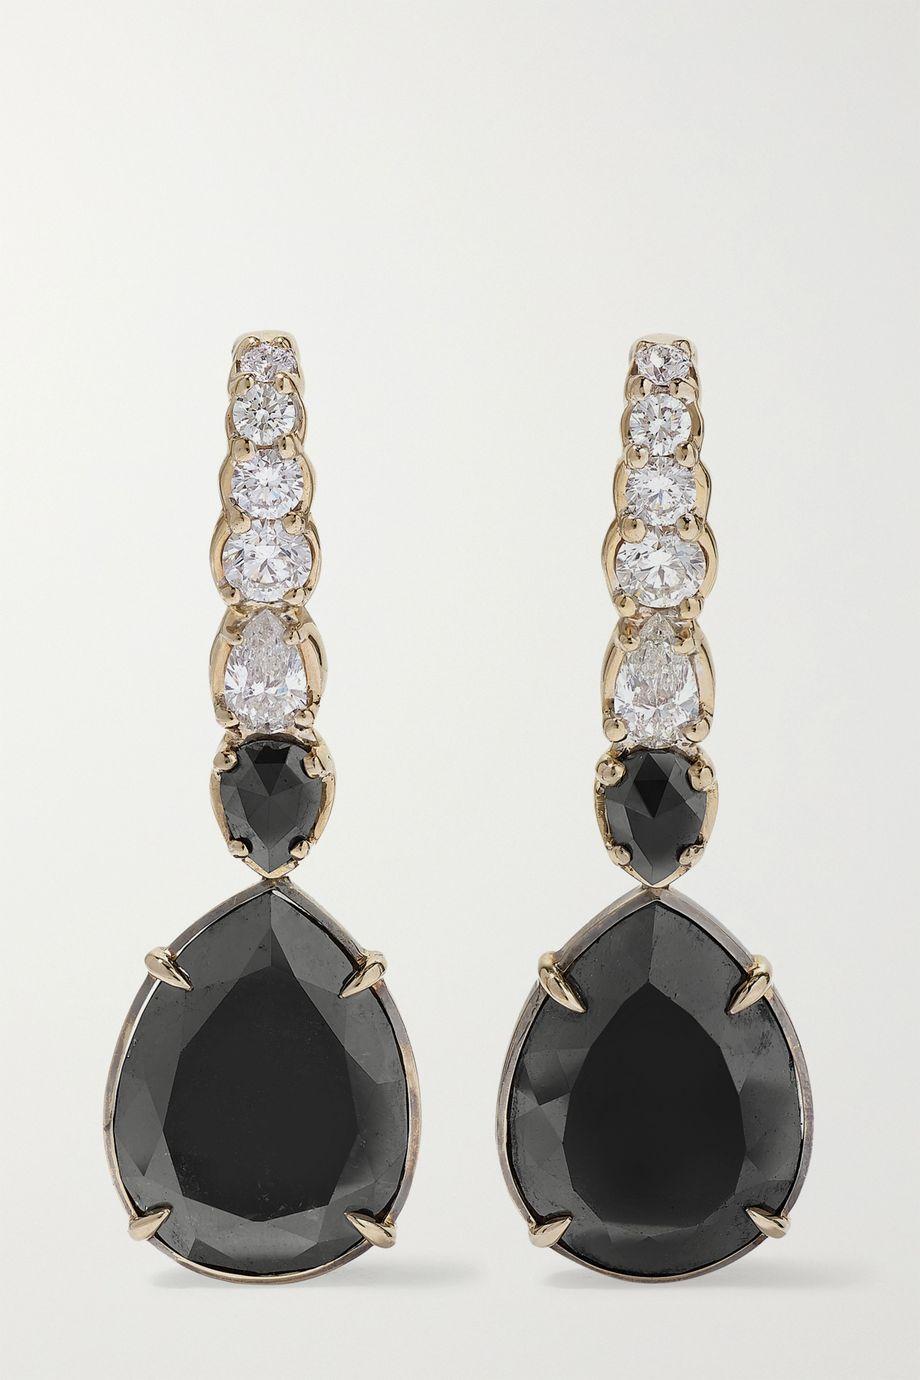 Ara Vartanian 18-karat white gold diamond earrings